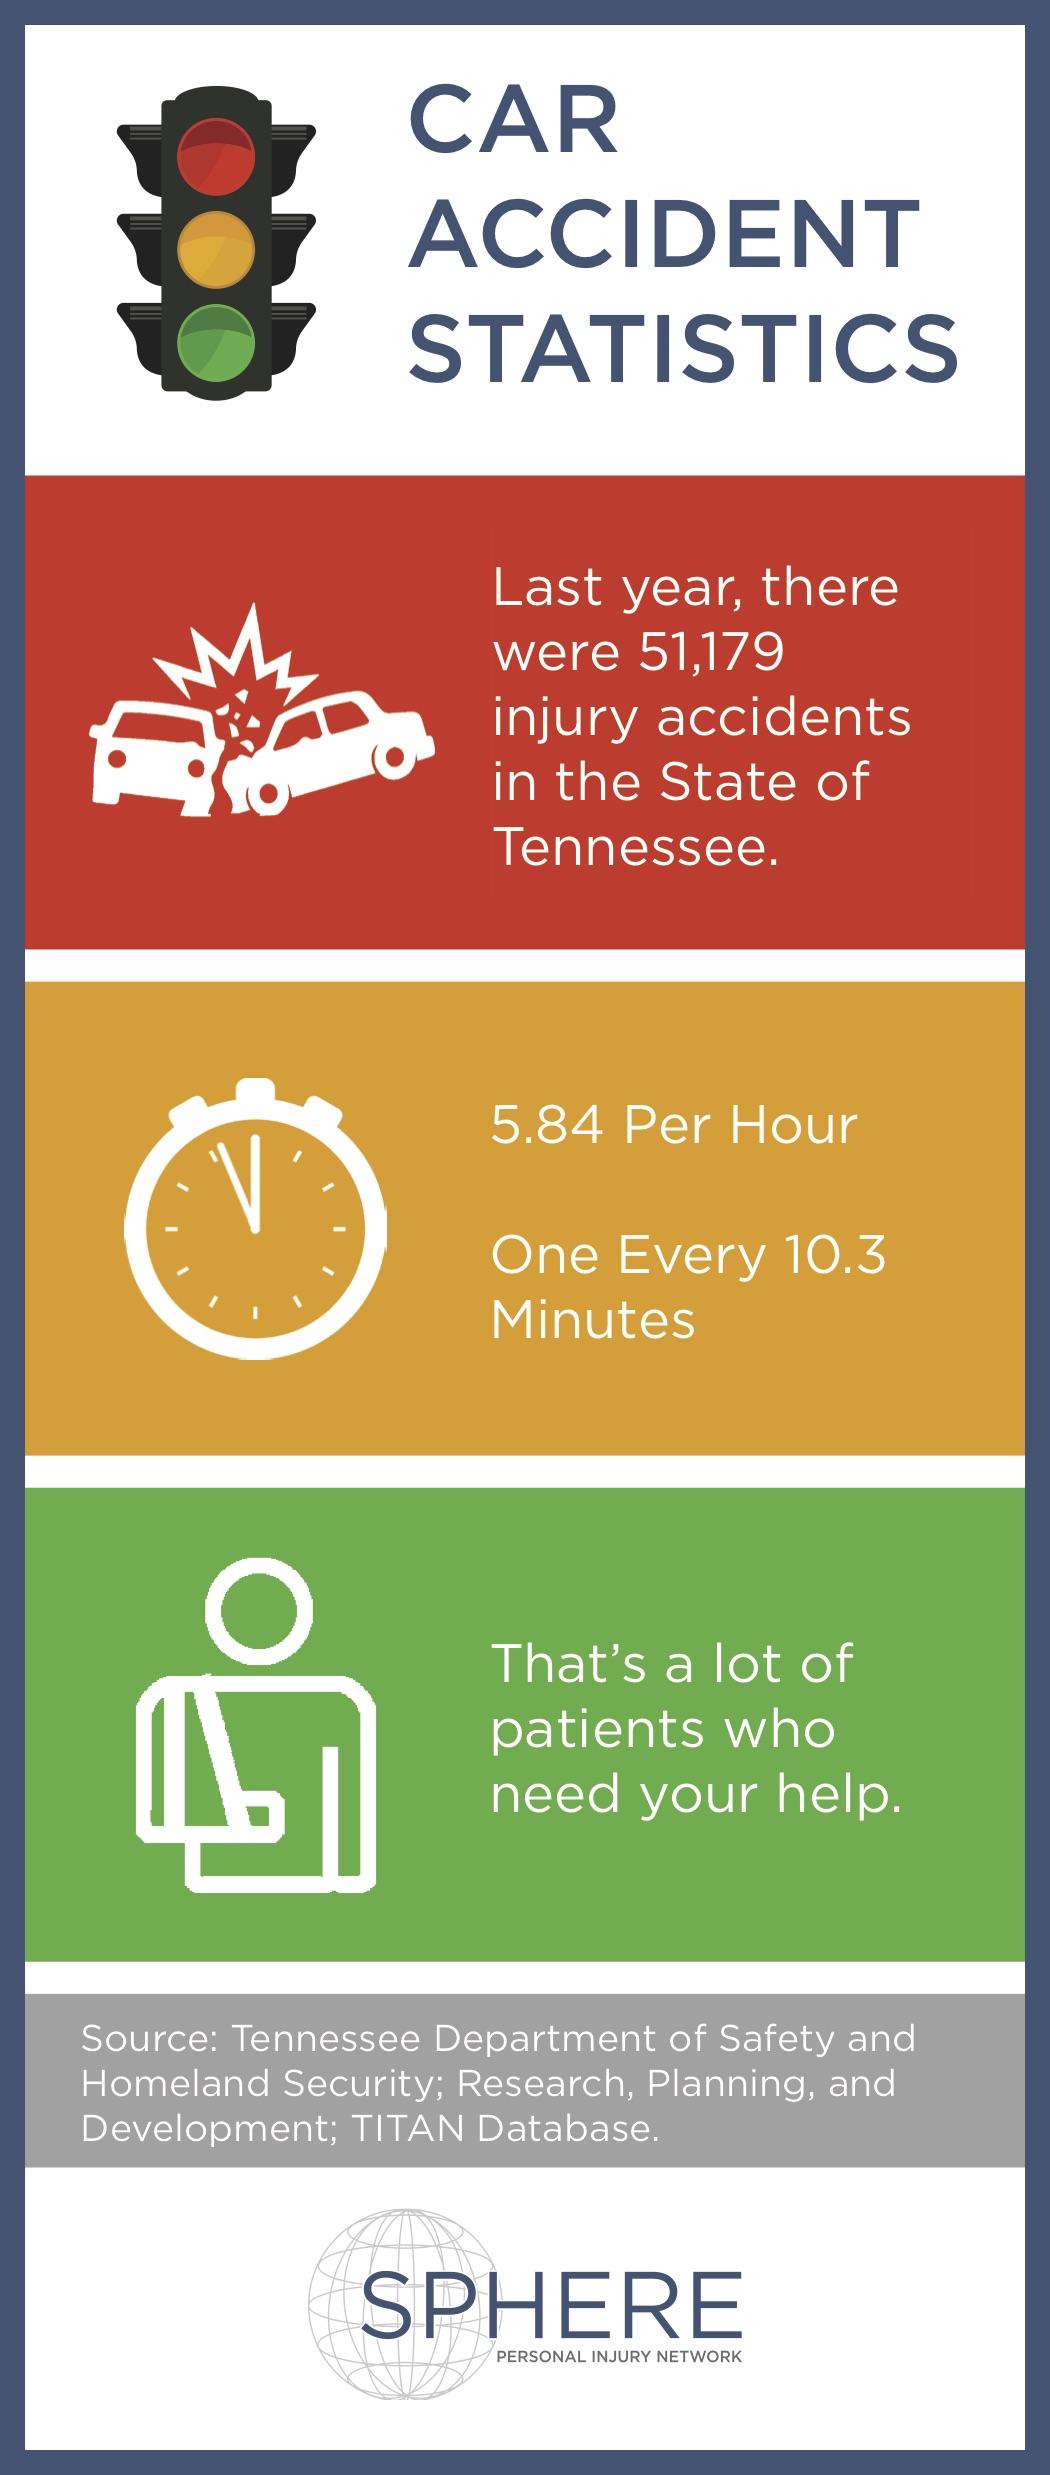 Car Accident Statistics-TN PROVIDER 5.10.18.jpg